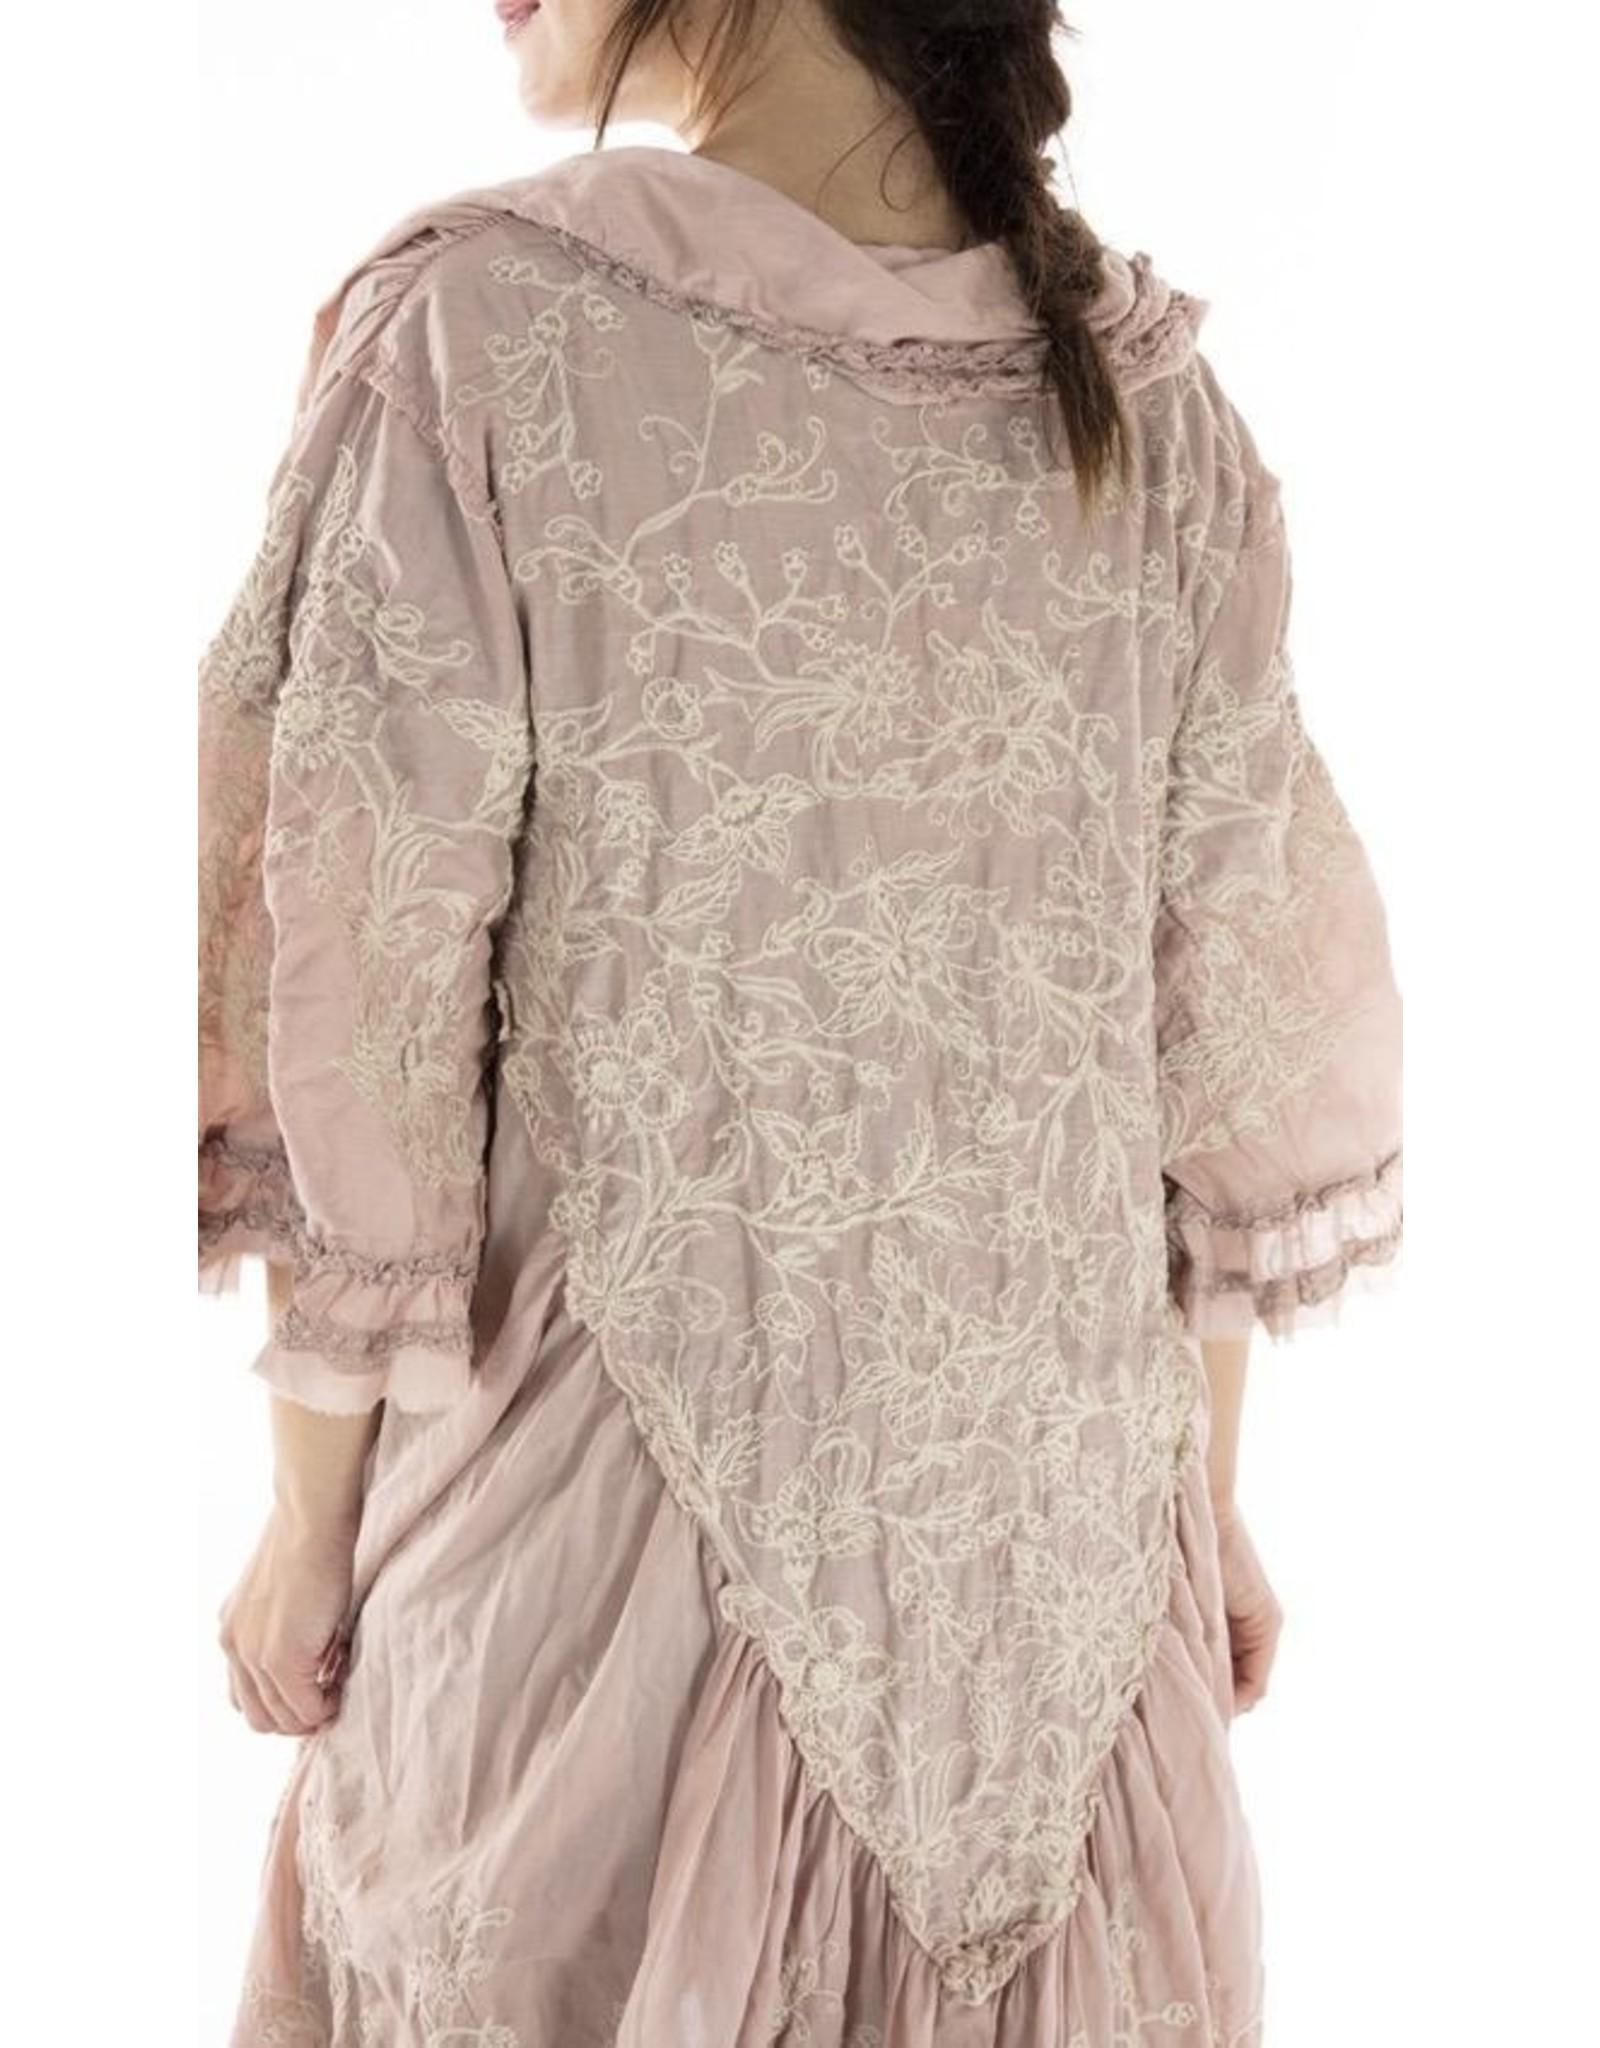 Magnolia Pearl Emmali Kimono - Peony